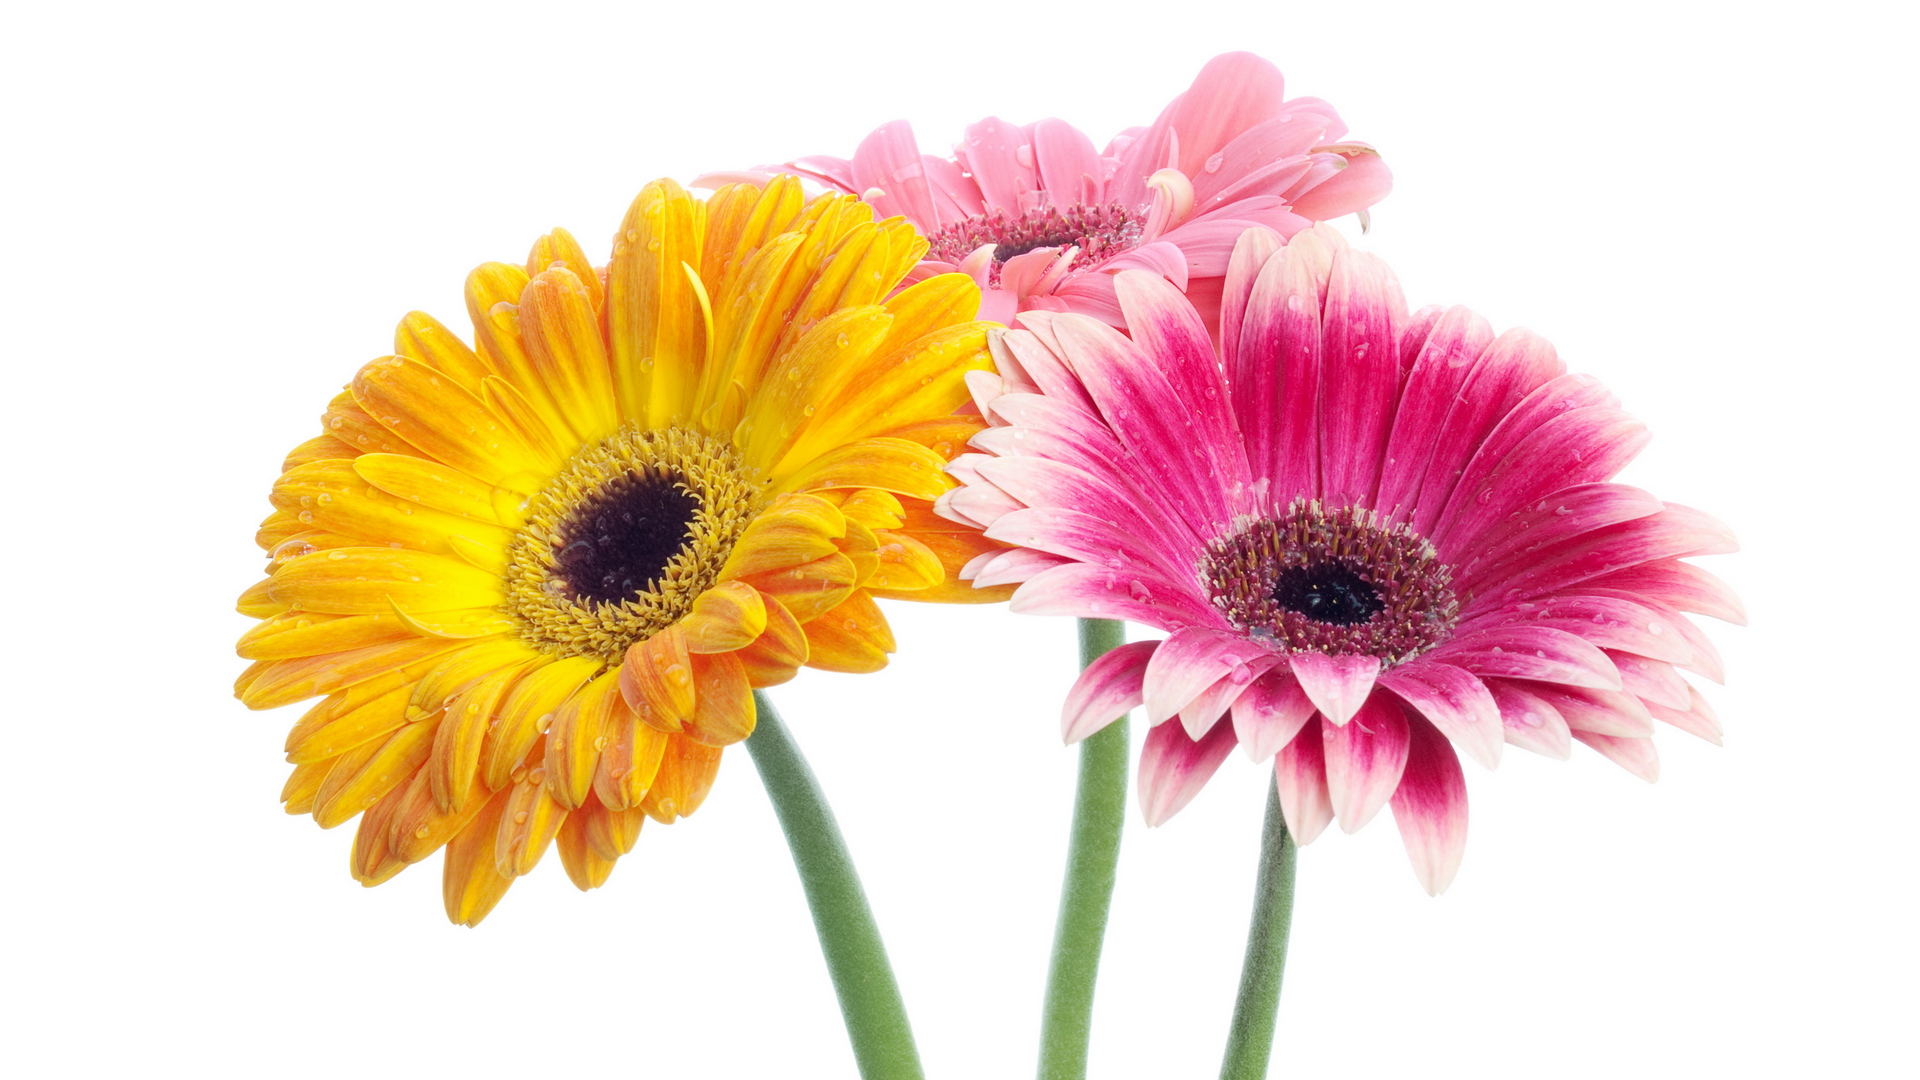 Gerbera flowers flower 1920x1080